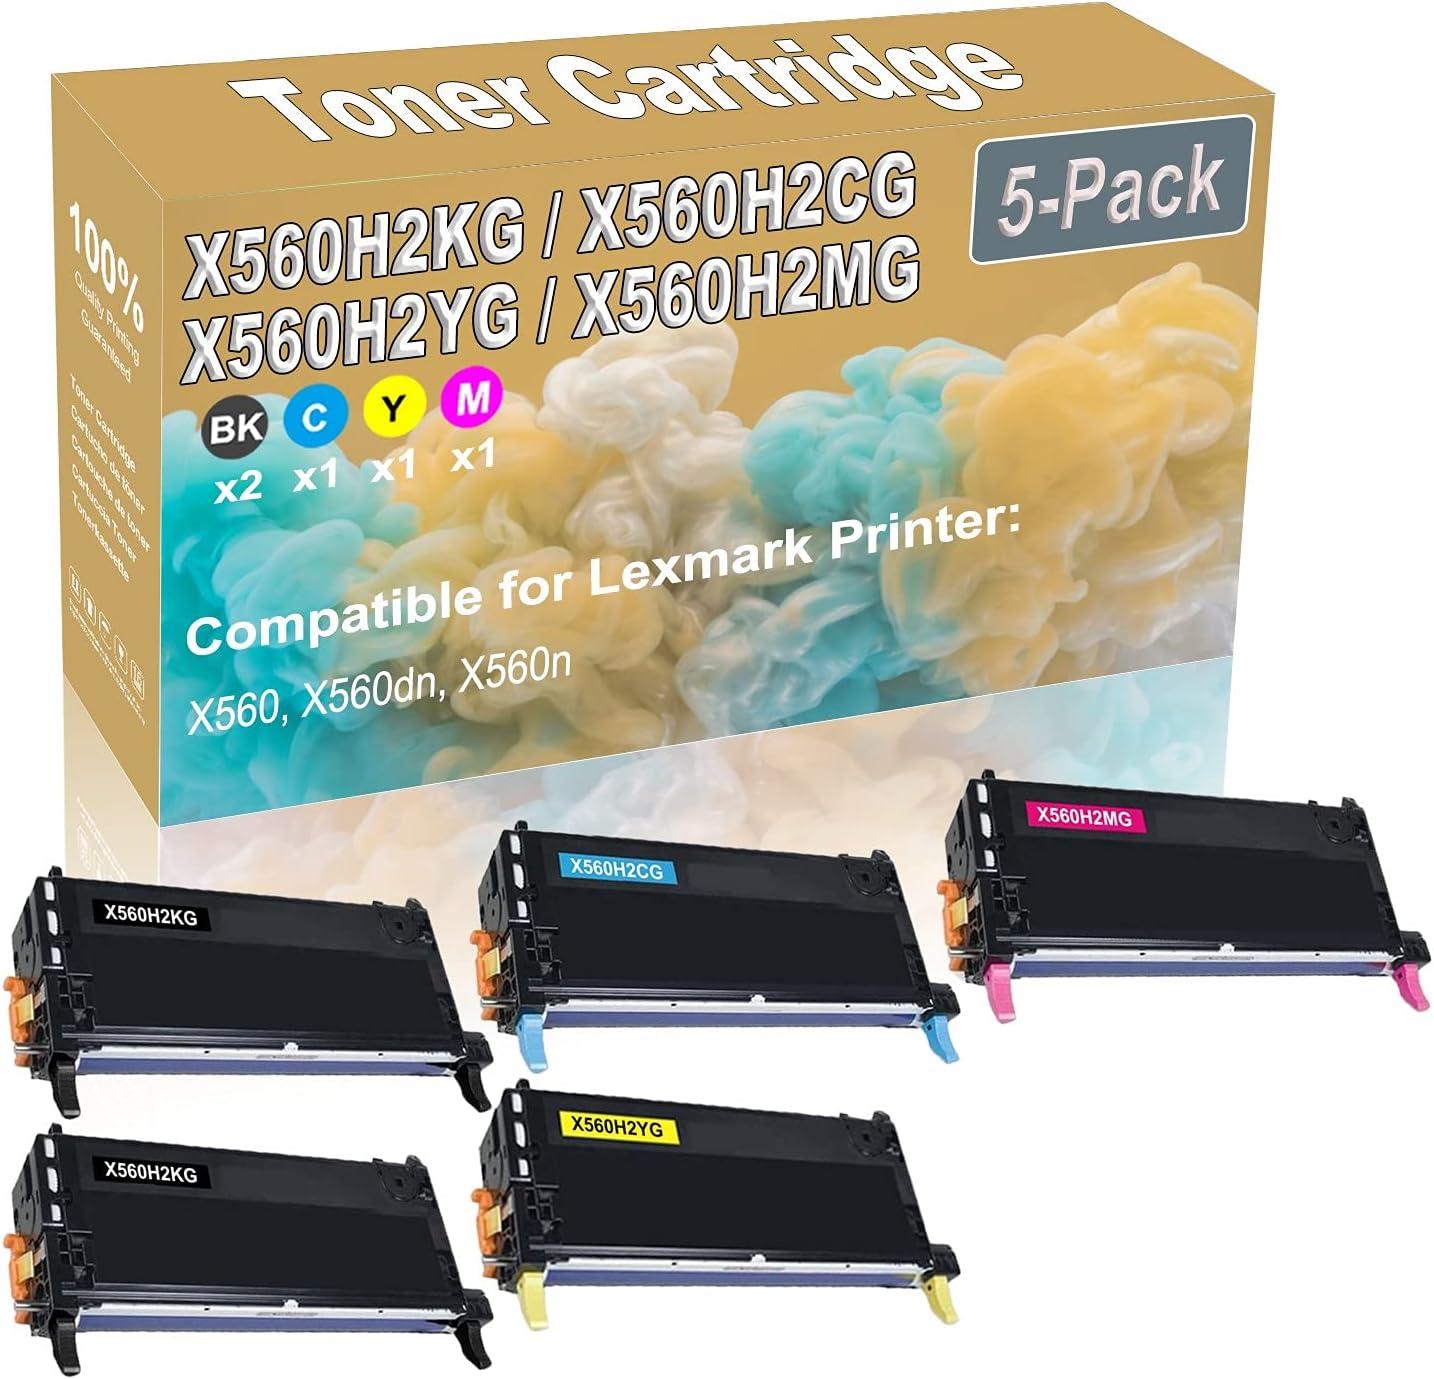 5-Pack (2BK+C+Y+M) Compatible X560 X560dn X560n Laser Printer Toner Cartridge (High Capacity) Replacement for Lexmark X560H2KG X560H2CG X560H2YG X560H2MG Printer Toner Cartridge